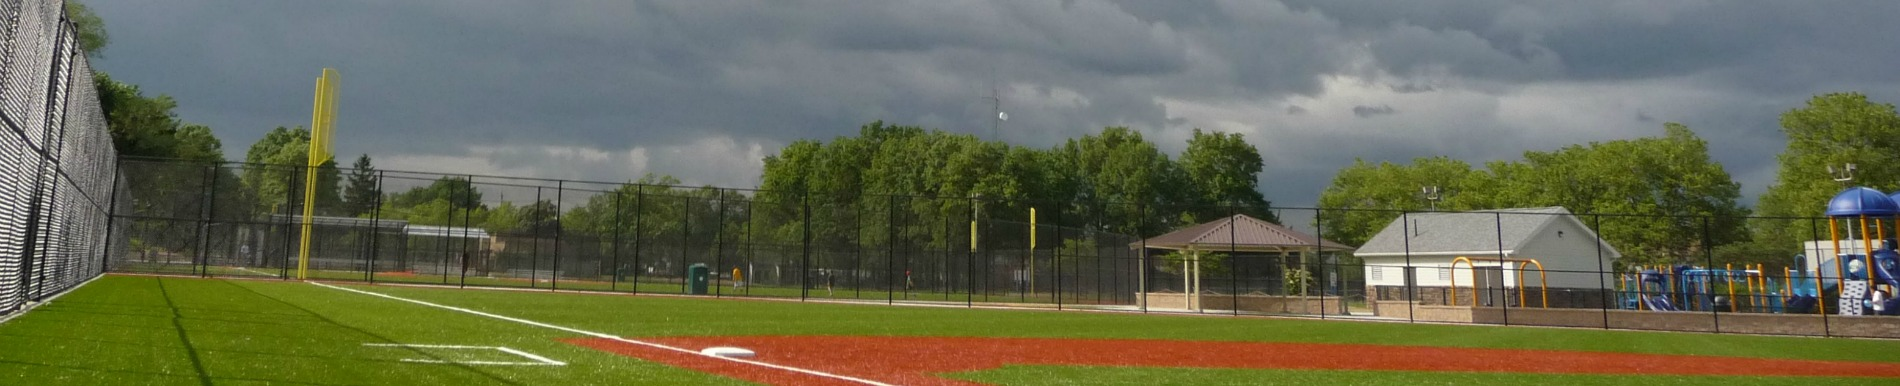 https://www.healthychildren.org/SiteCollectionImage-Homepage-Banners/lightning_sports_safety_banner.jpg